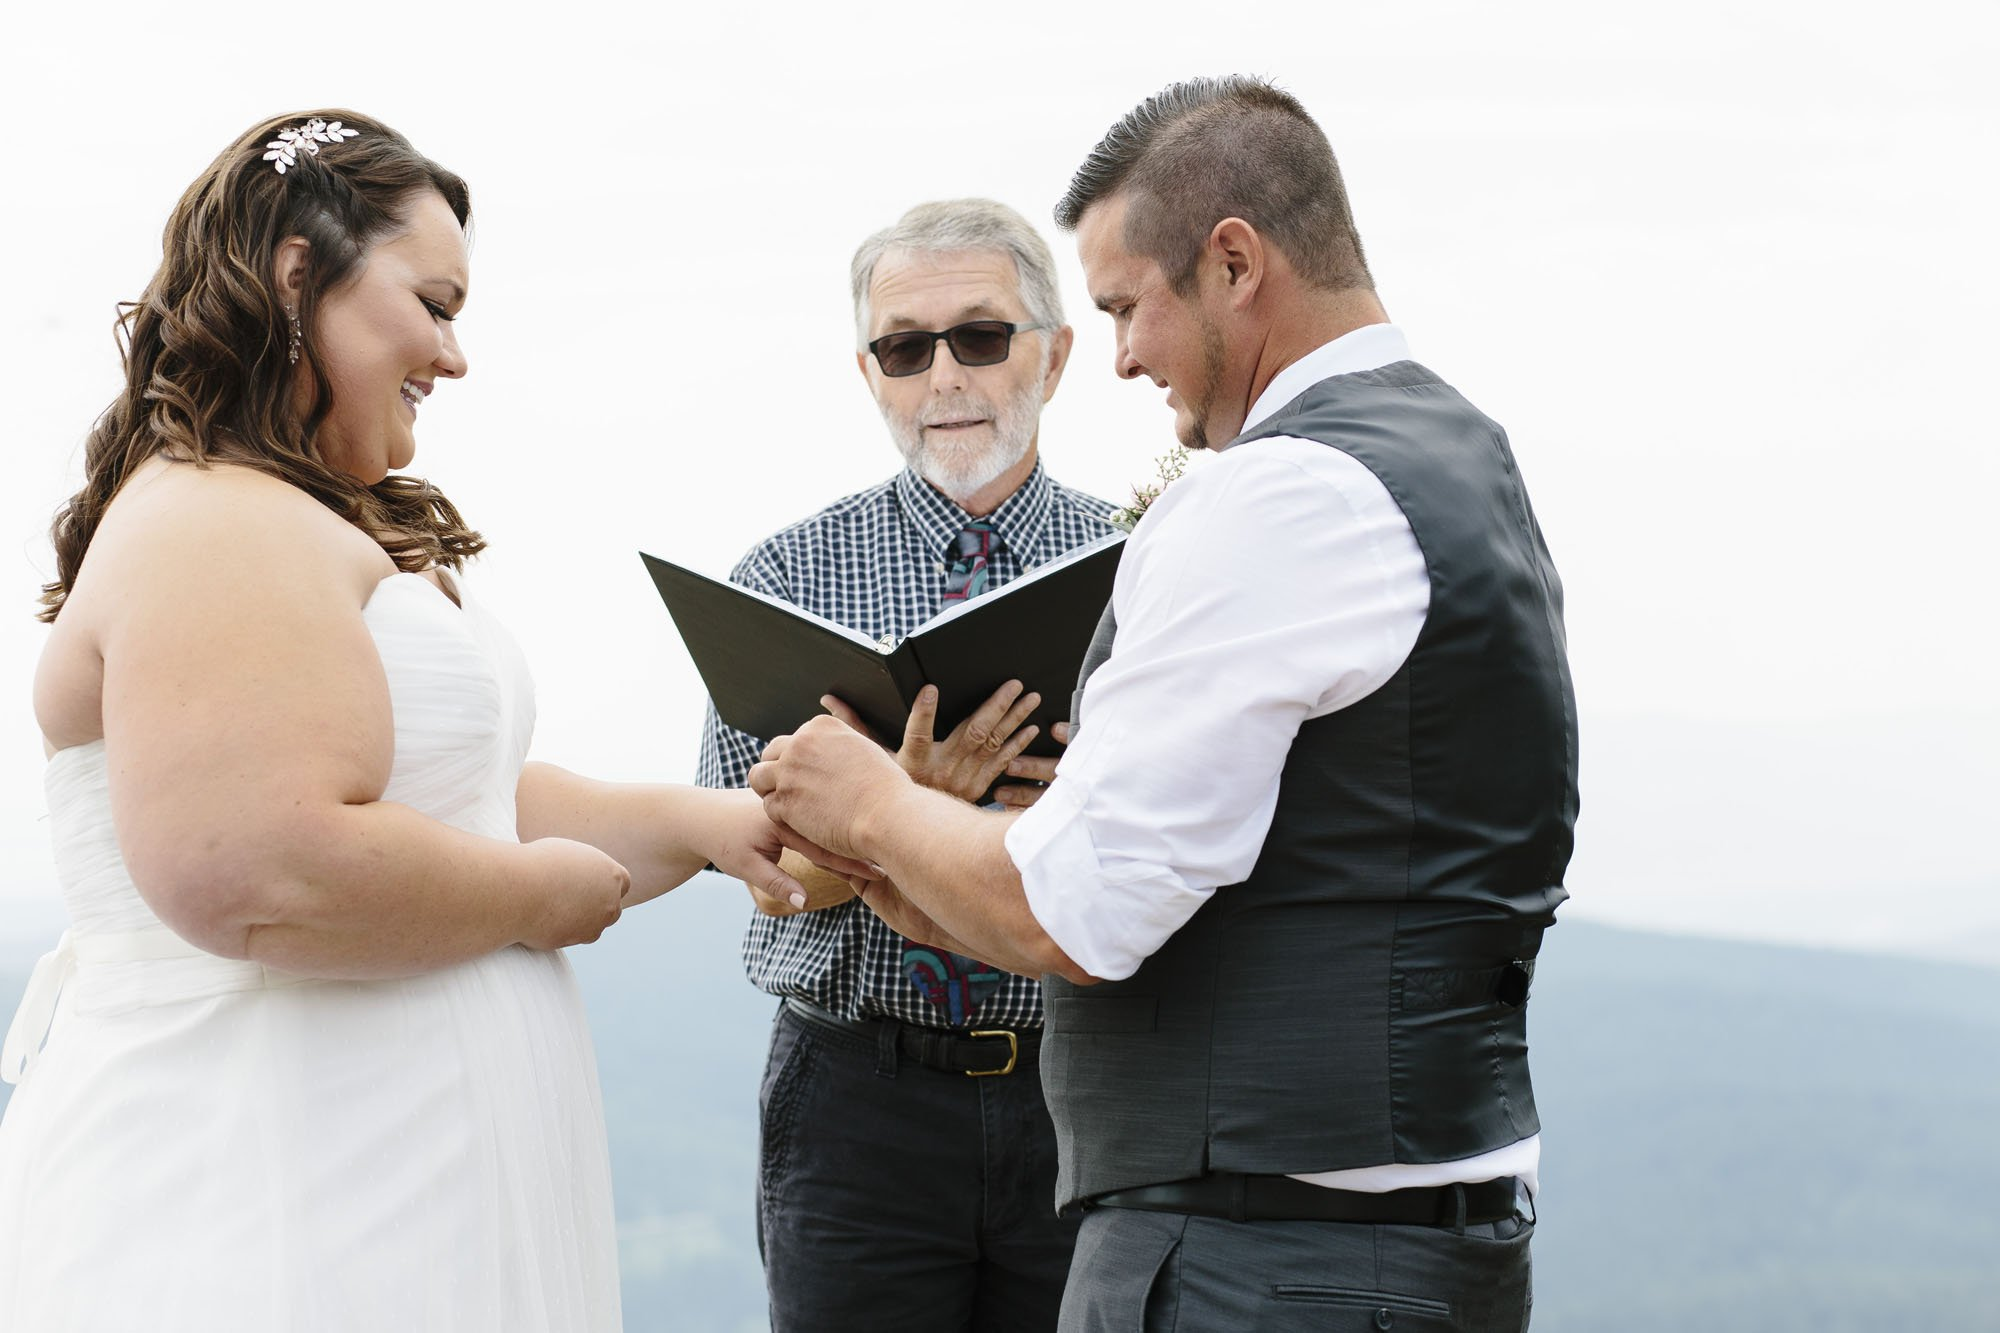 Mt Spokane Elopement Wedding Vista House // Emily Wenzel Photography